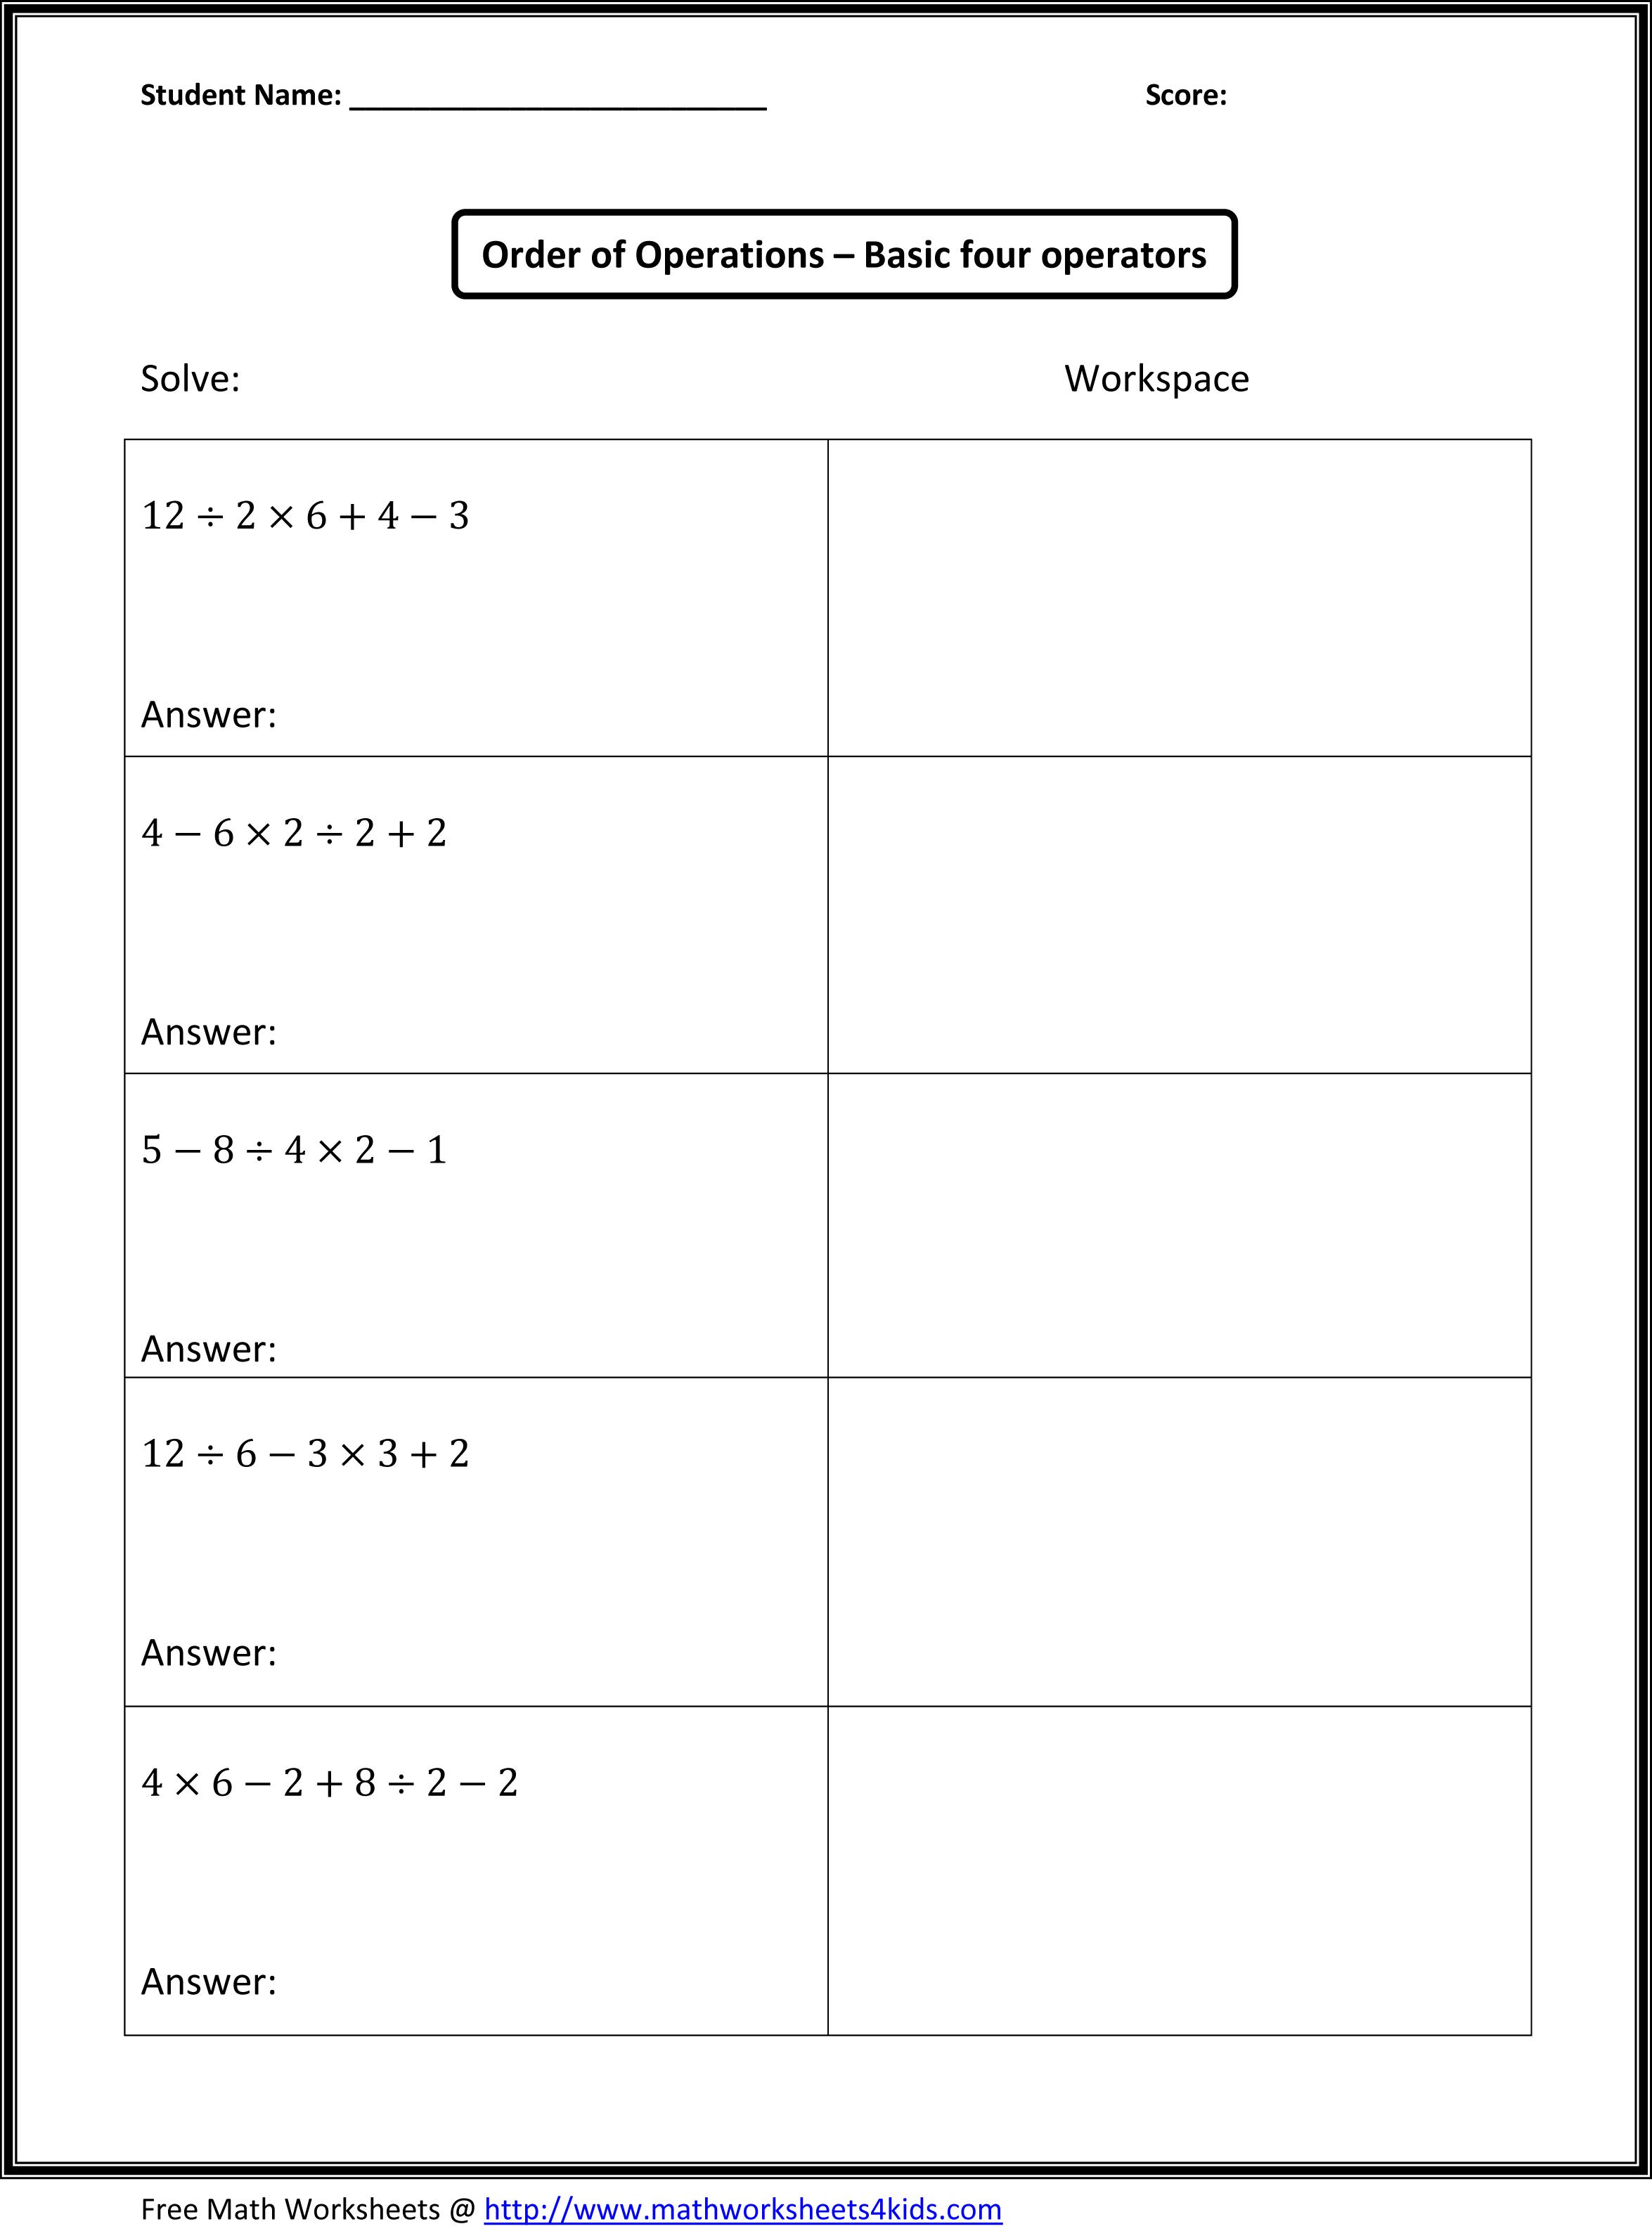 17 Best Images Of Sequencing Worksheets Grade 2